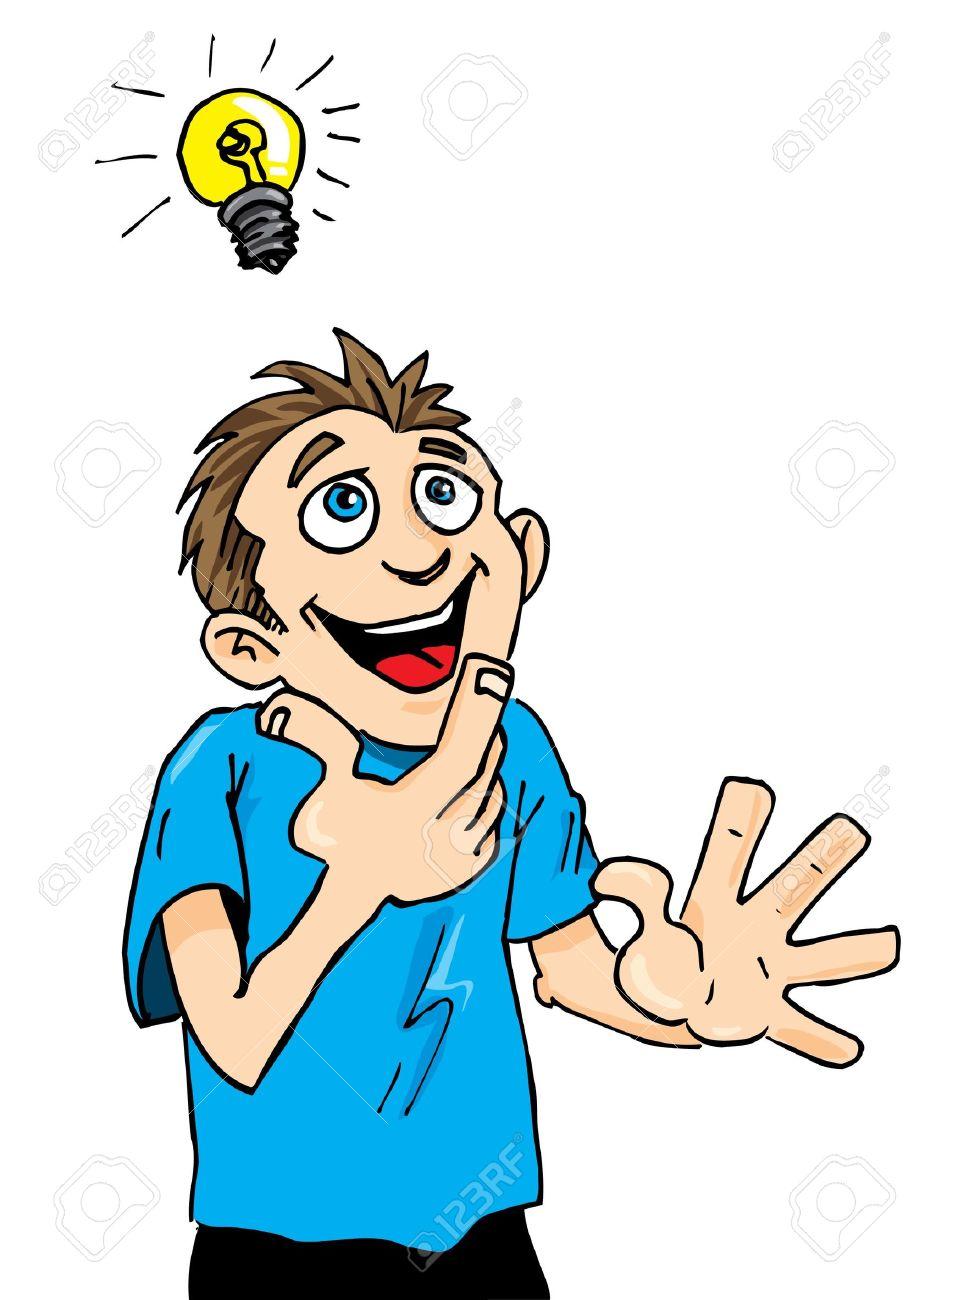 Cartoon man gets a bright idea. A light bulb above his head - 10365772